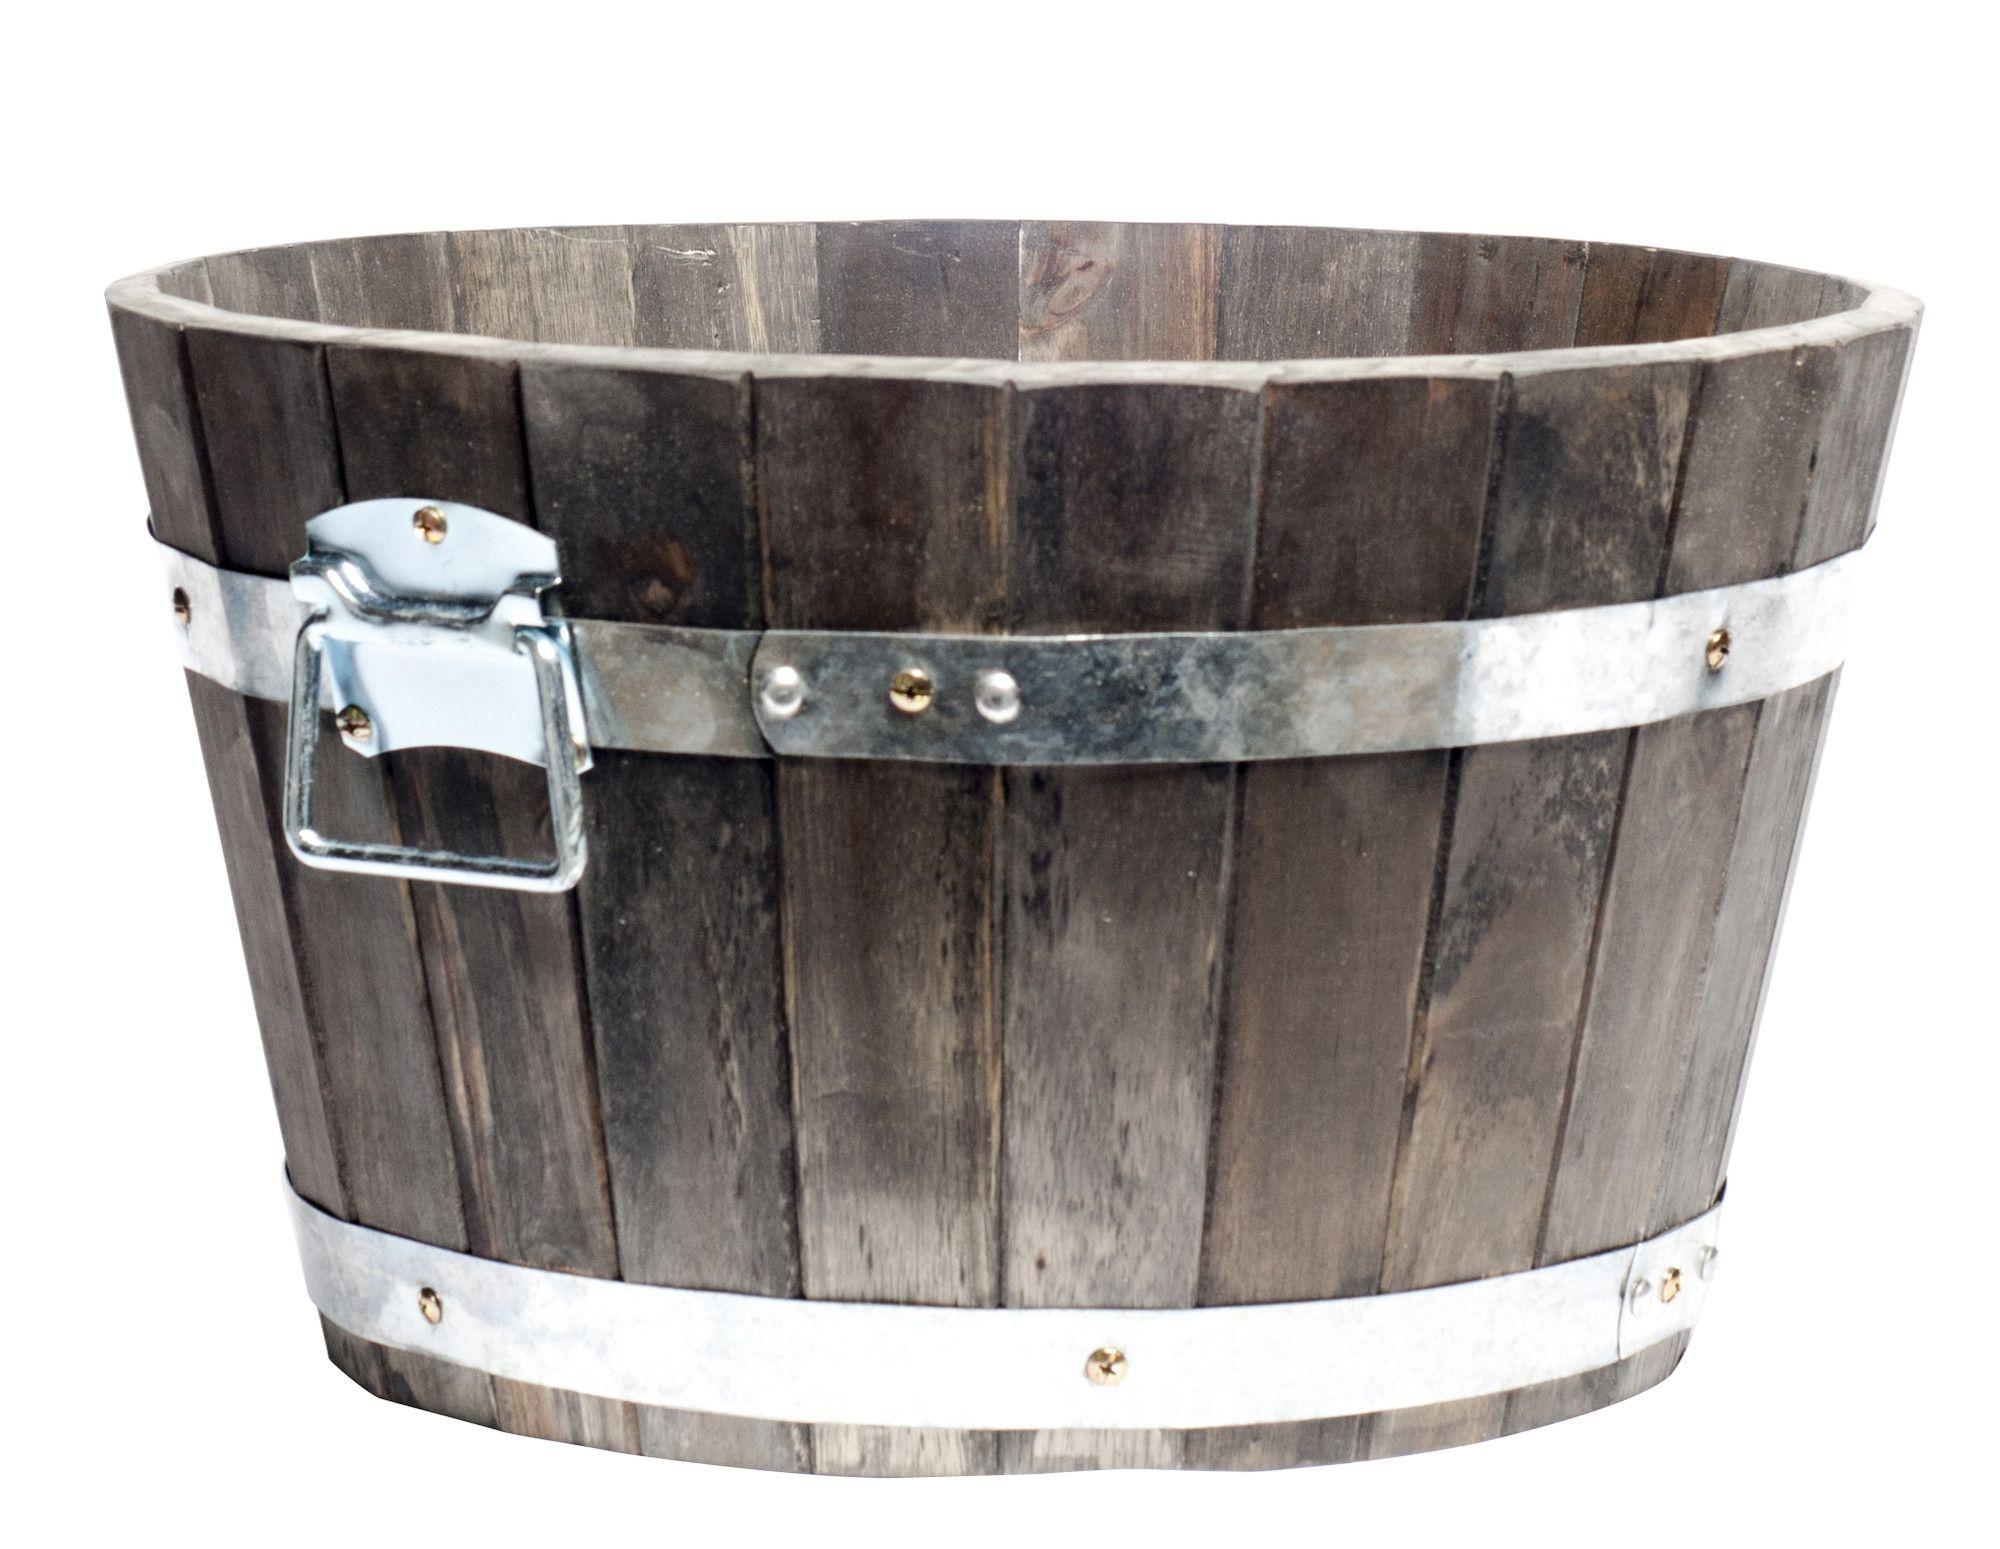 Cadix Acacia Round Planter Reviews Wayfair Uk Barrel Planter Buy Plant Pots Wooden Barrel